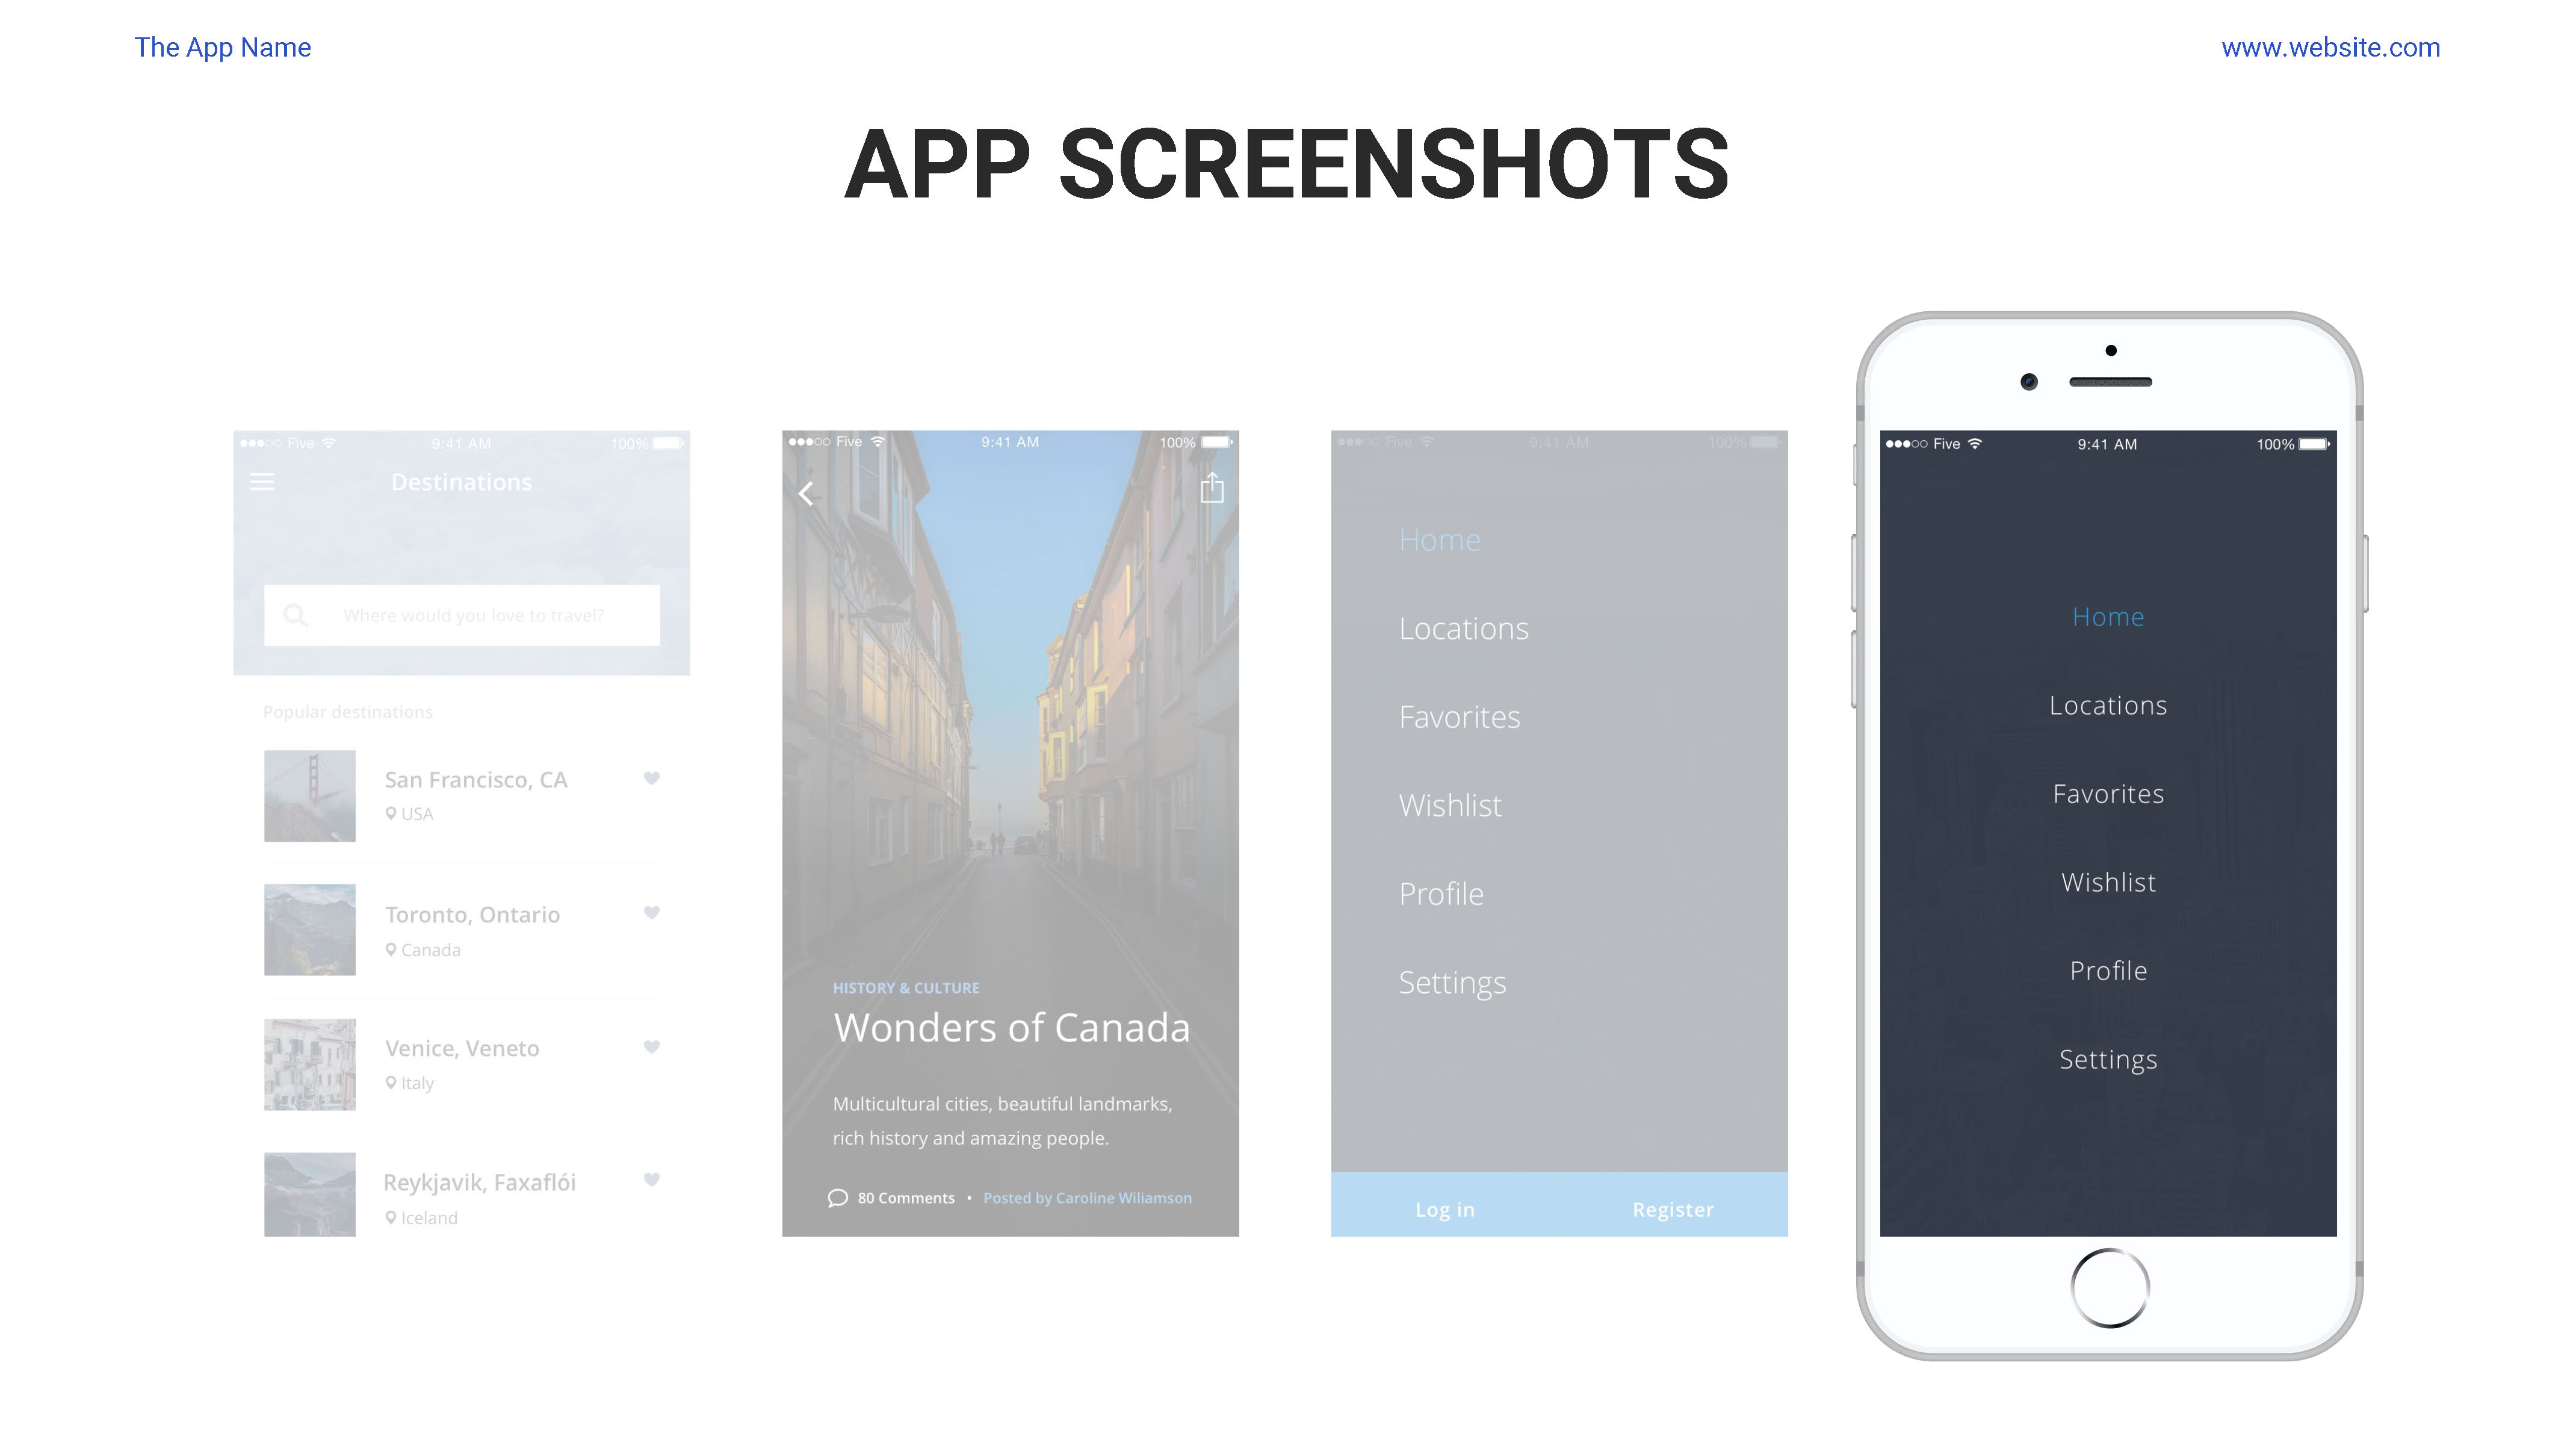 Mobile App Showcase Google Slides Pitch Deck by Spriteit | GraphicRiver